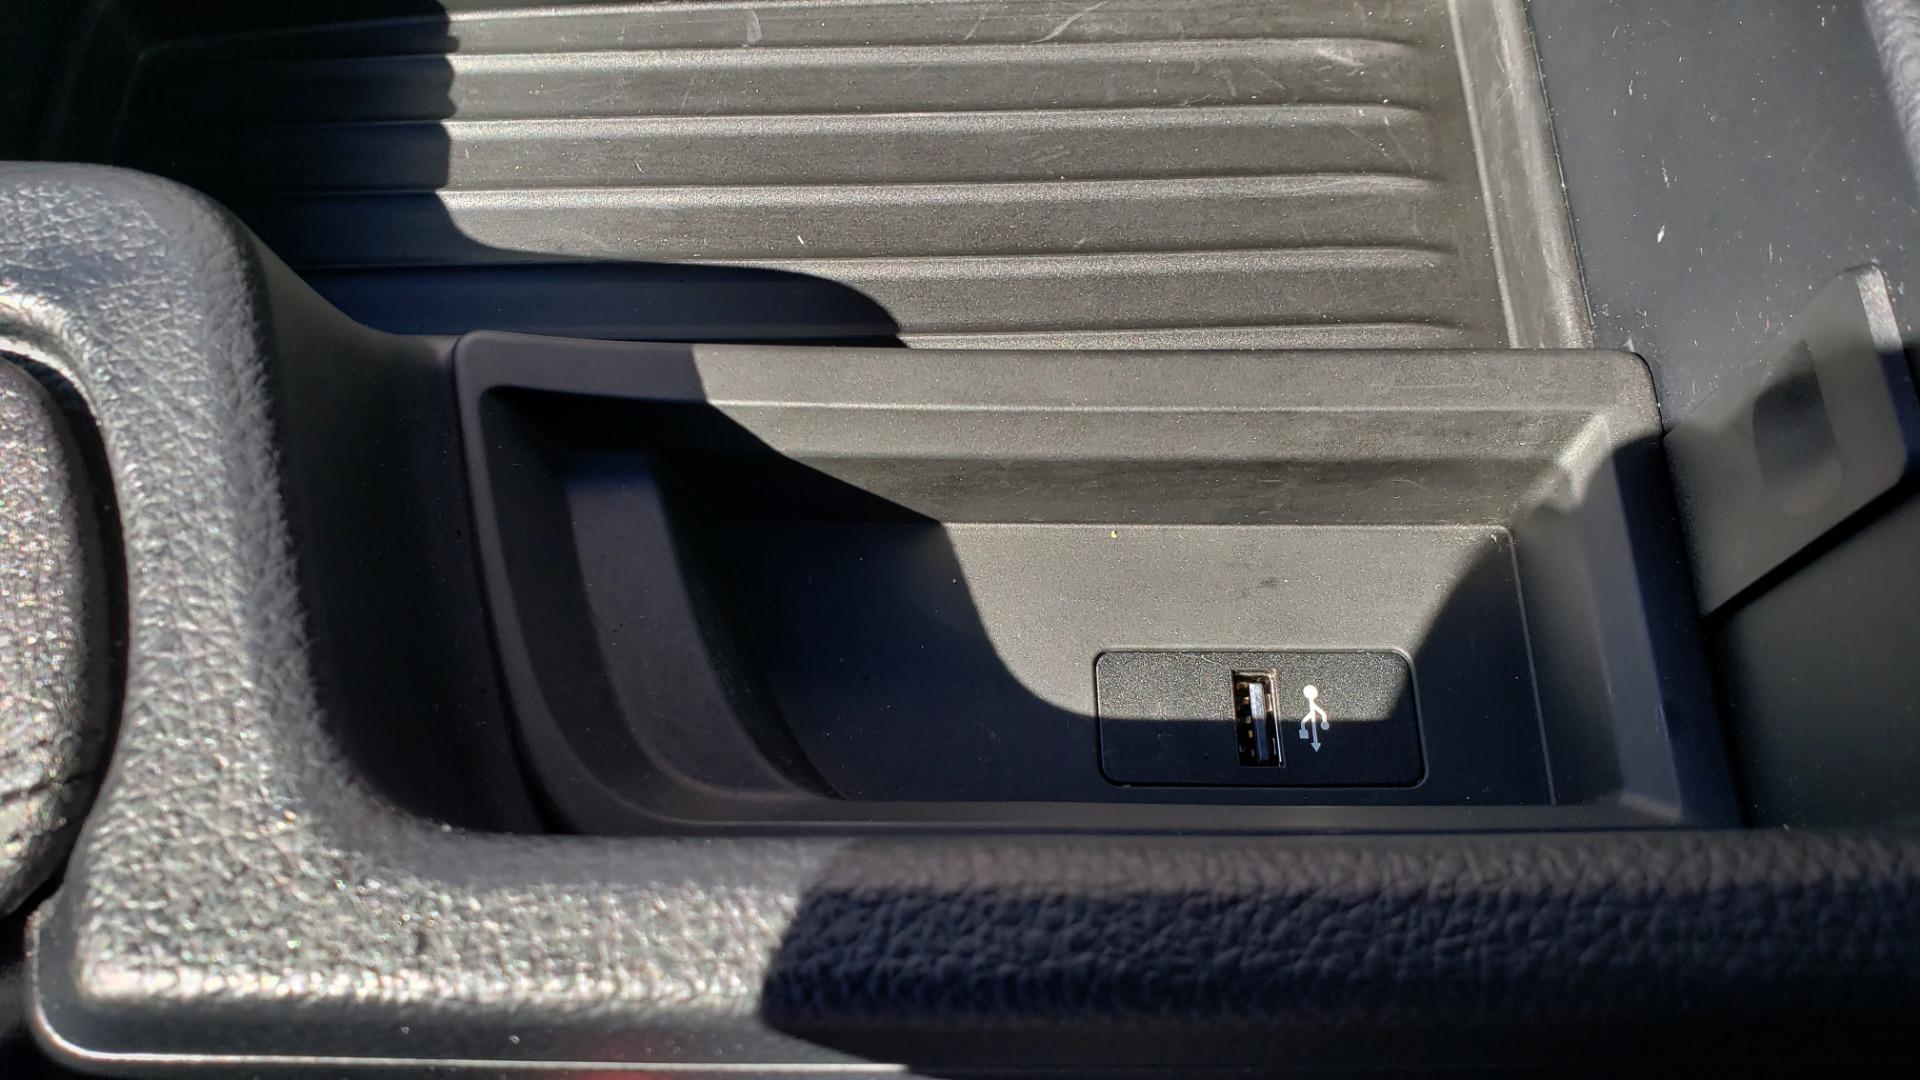 Used 2018 BMW 4 SERIES 430IXDRIVE / PREMIUM / NAV / SUNROOF / ESSENTIALS PKG for sale $27,795 at Formula Imports in Charlotte NC 28227 59